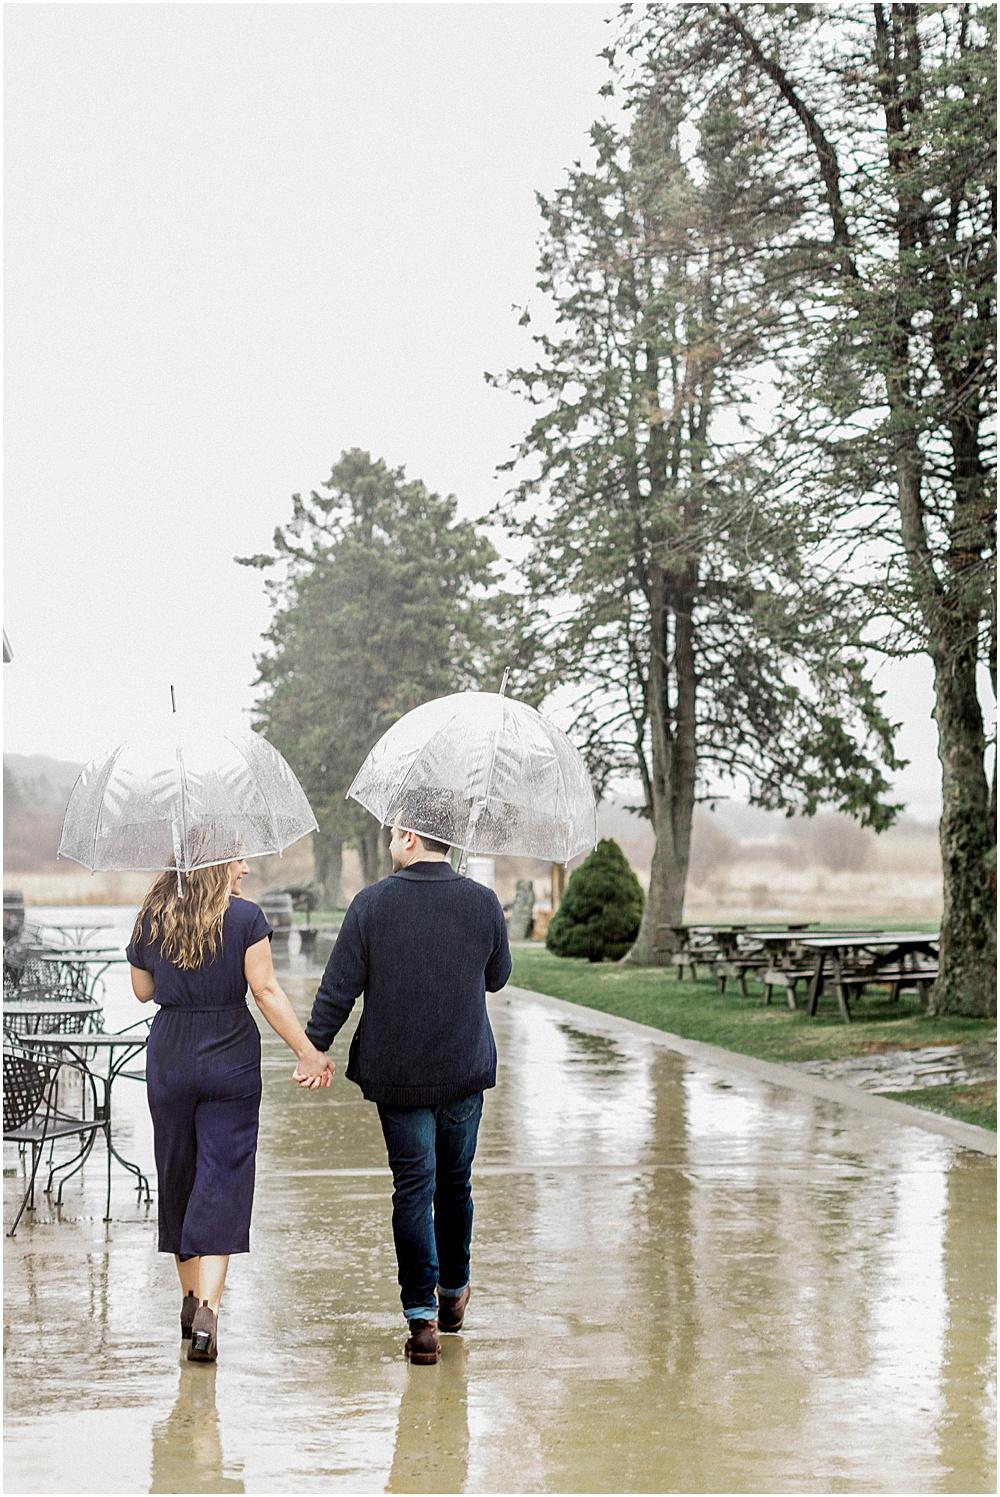 newport_rhode_island_rainy_engagement_session_boston_wedding_photographer_meredith_jane_photography_photo_0175.jpg